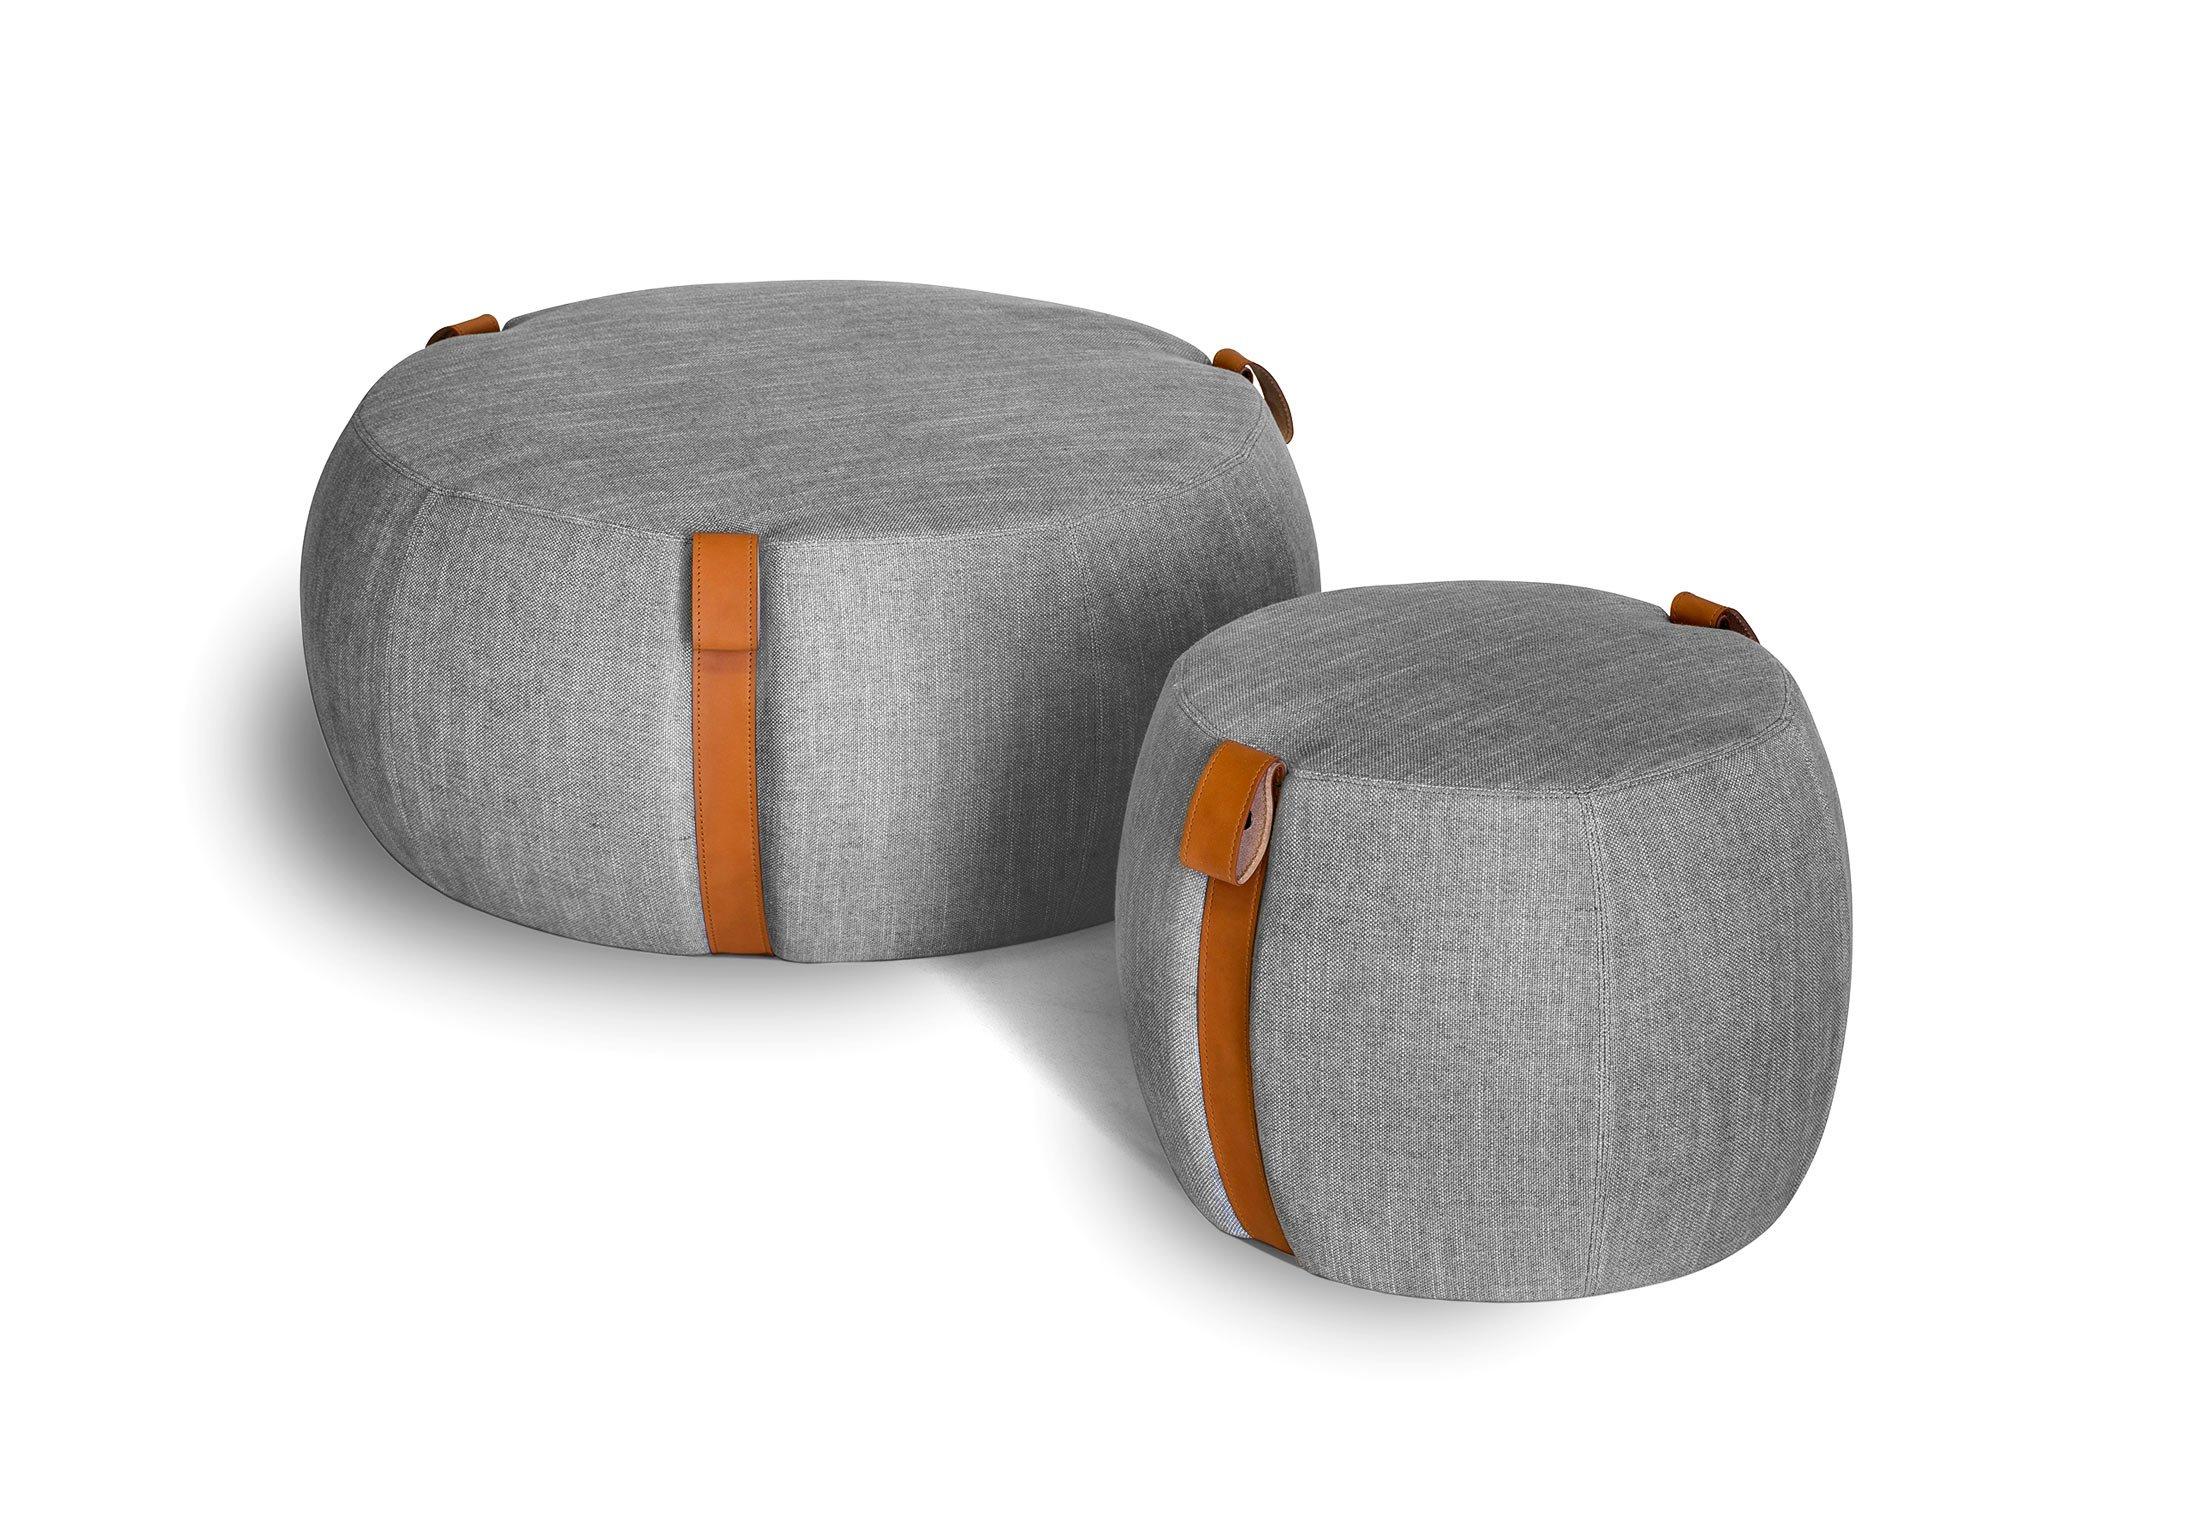 Azure Lema Notch seating